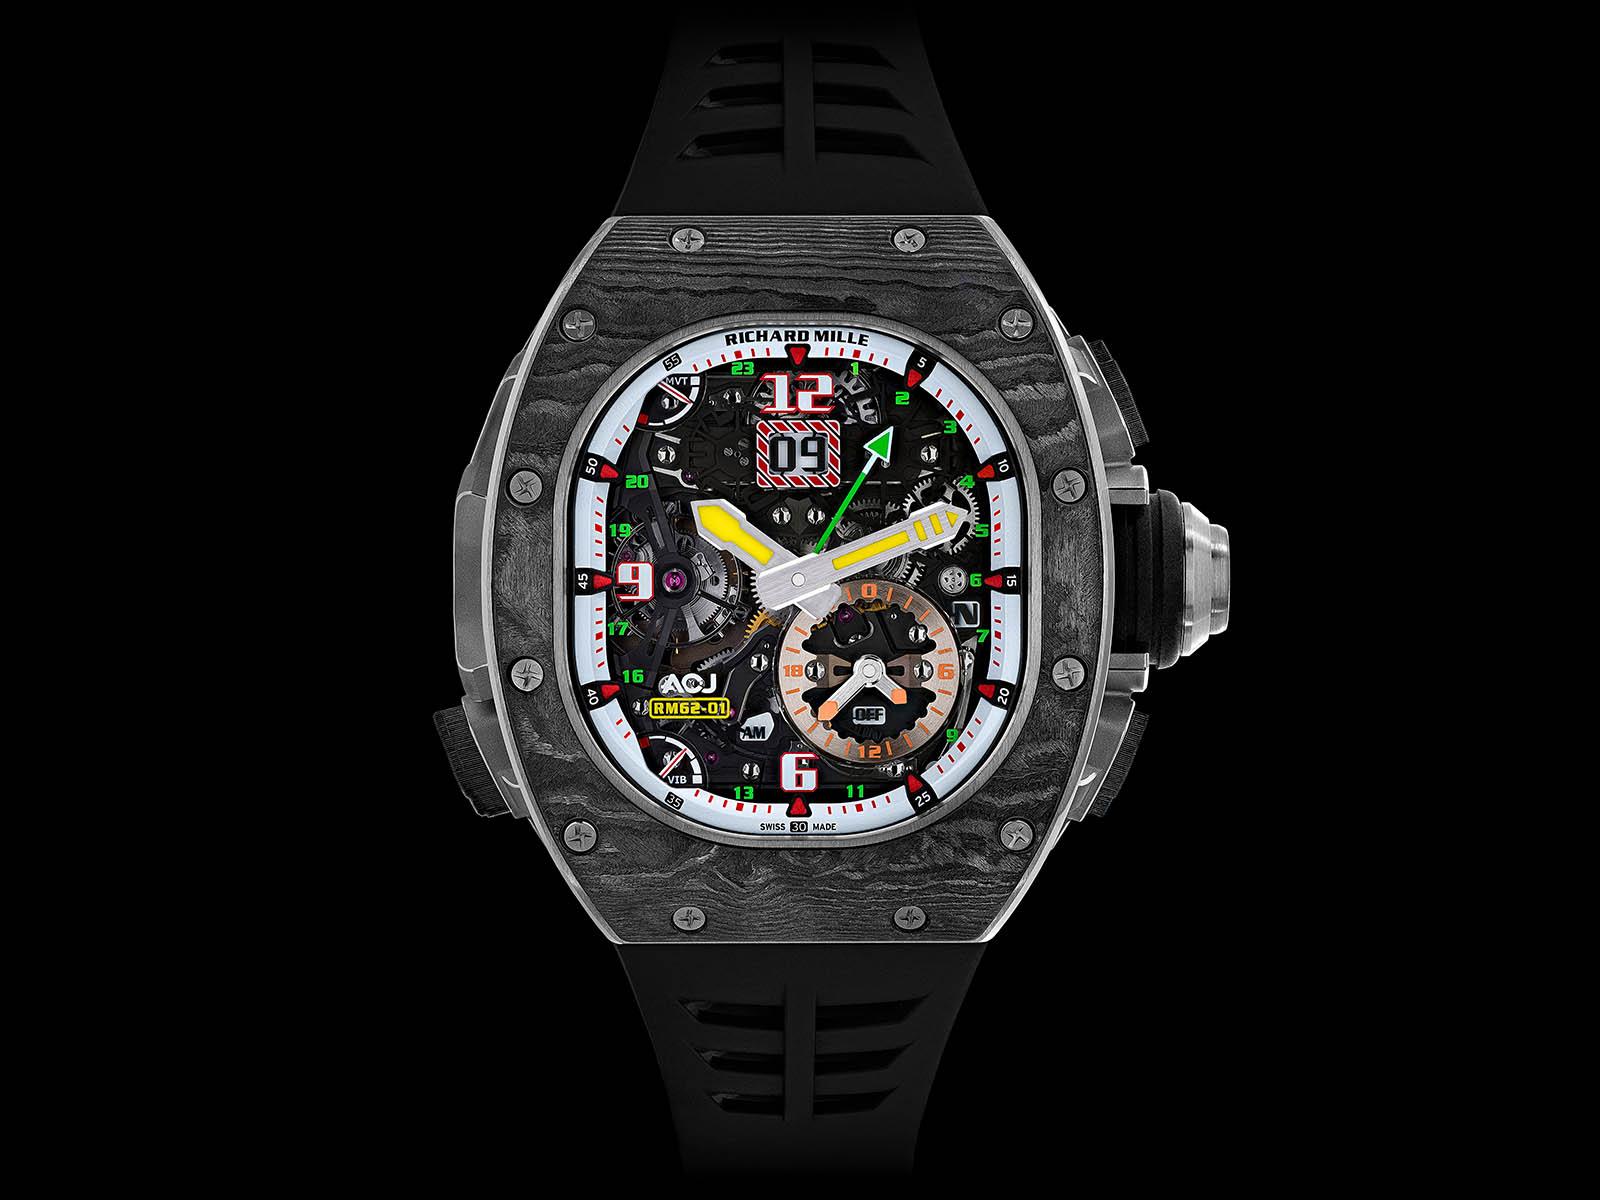 mechanical-alarm-watches-richard-mille-rm-62-01-1.jpg